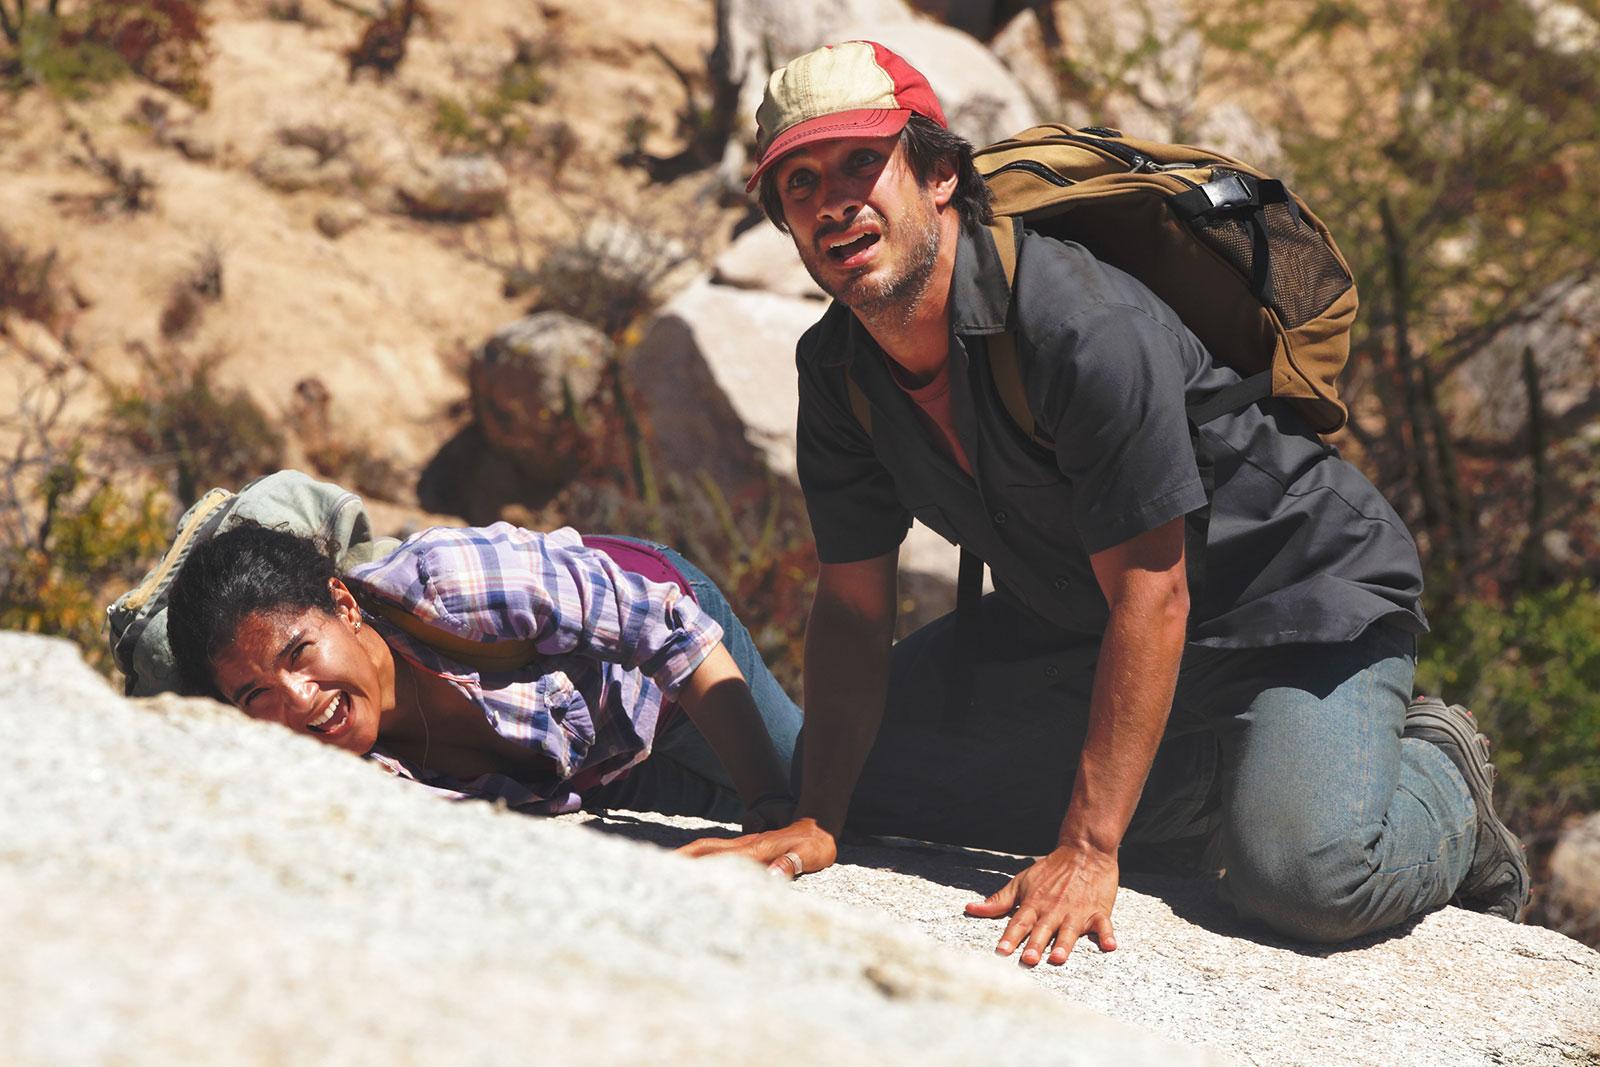 DESIERTO - Image 9 film Jonas Cuaron 2016 - Go with the Blog